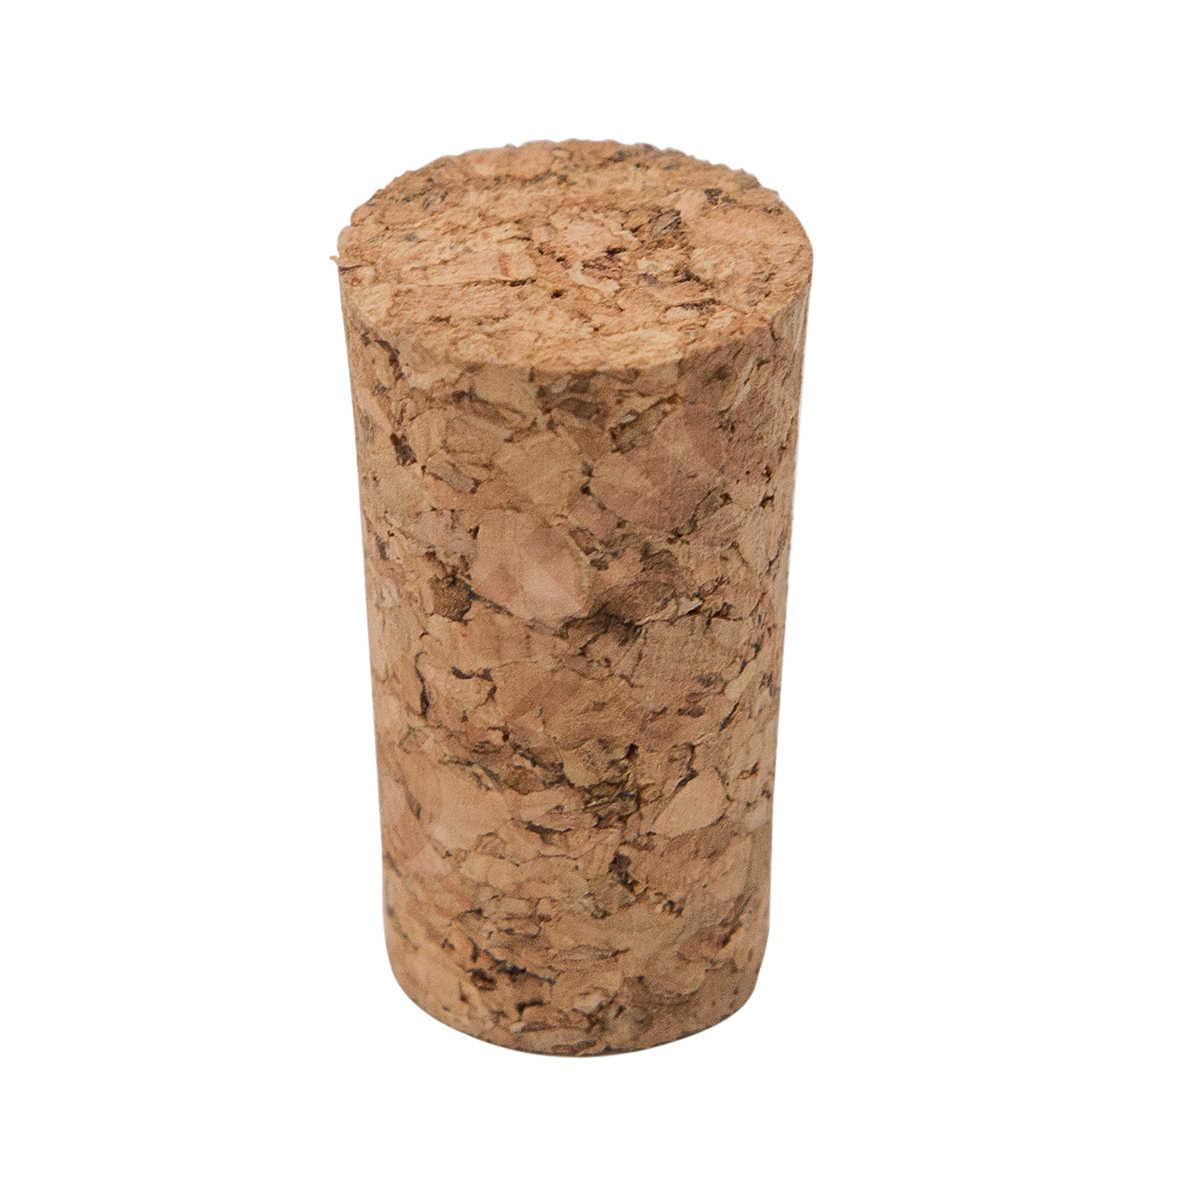 Code: EE#022 Bottle Stopper Cork $4.00